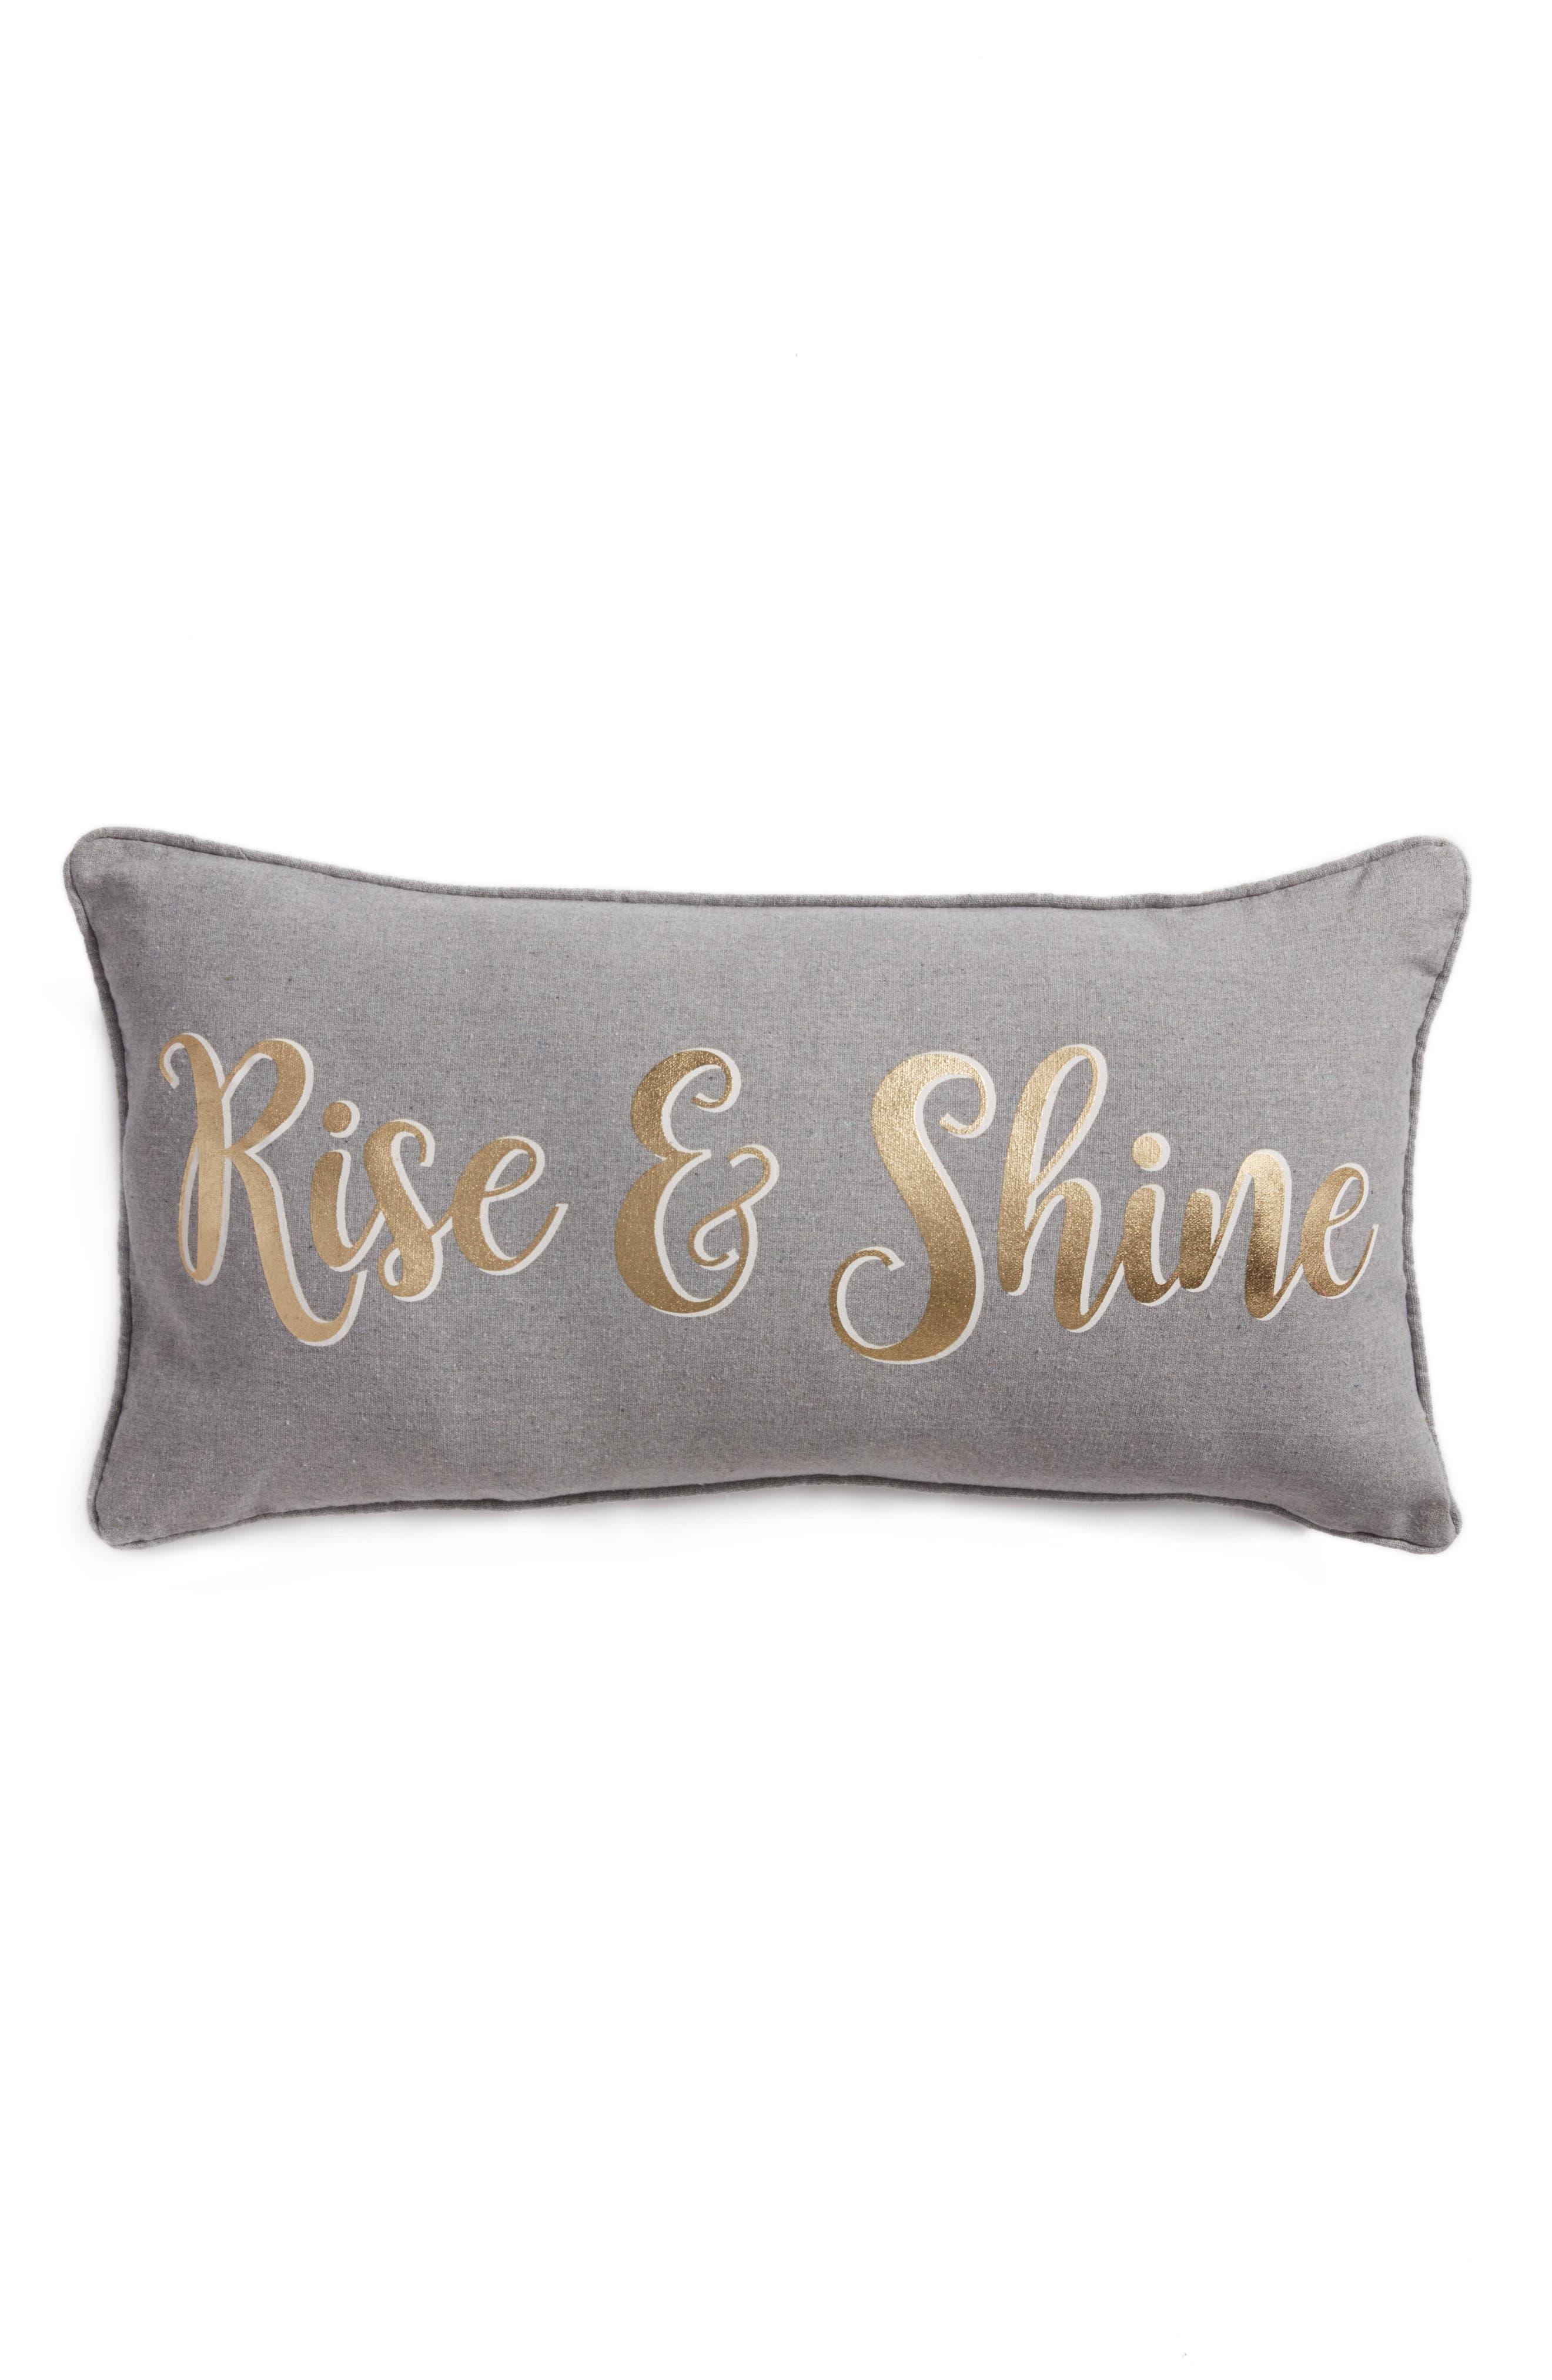 Arden Rise & Shine Accent Pillow,                         Main,                         color, 020